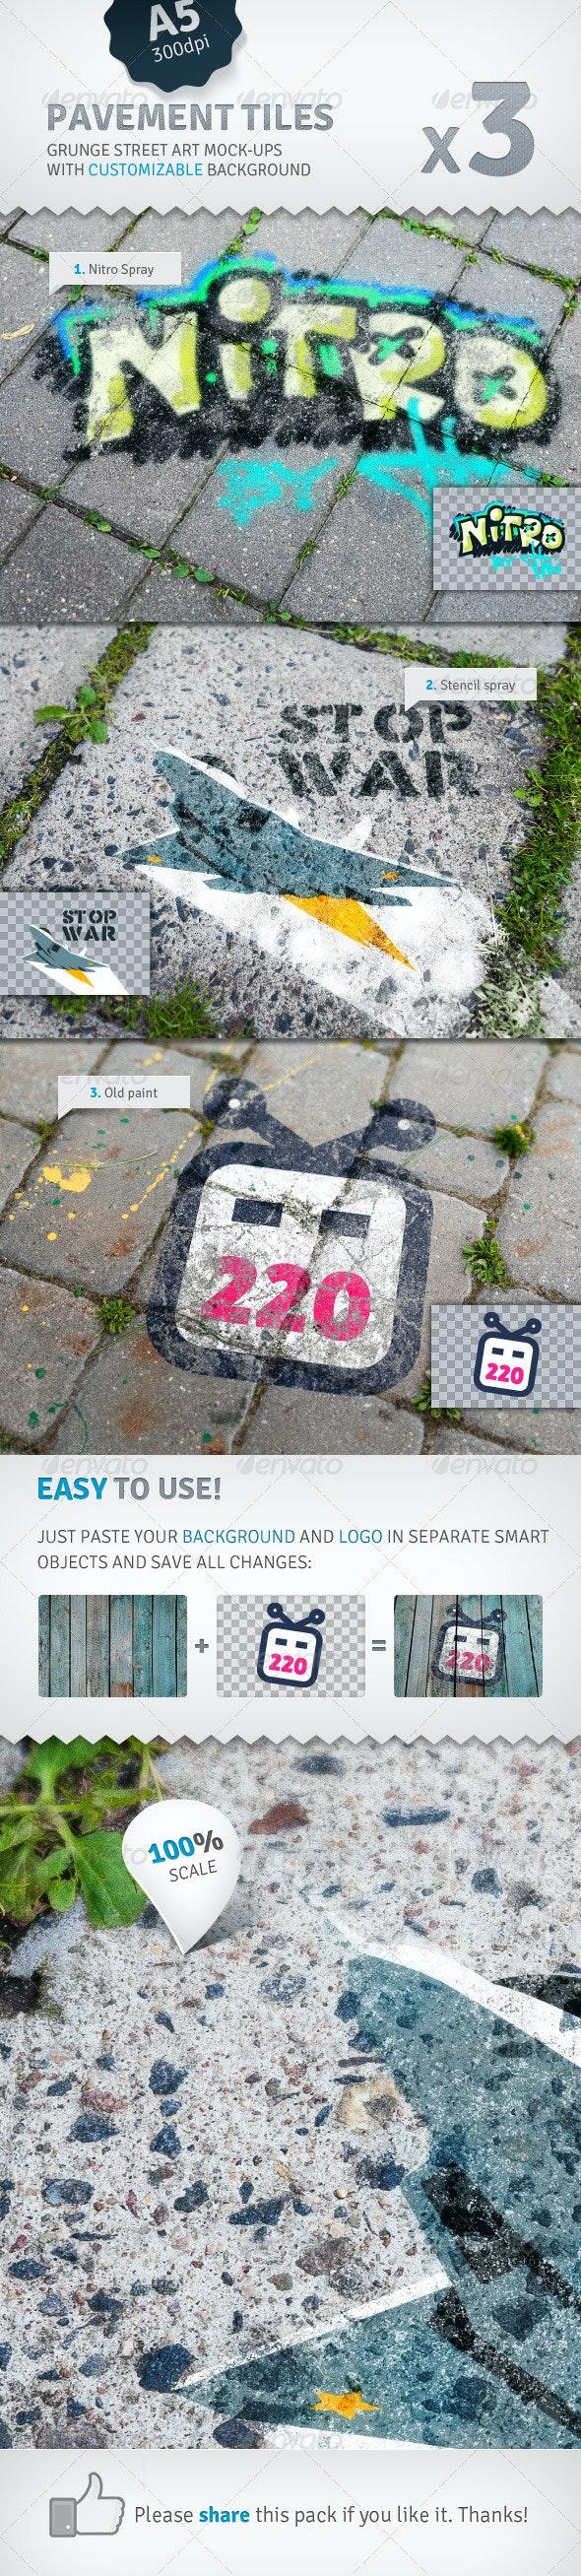 Pavement Tiles - 3 Graffiti Street Art Mockups - Miscellaneous Displays